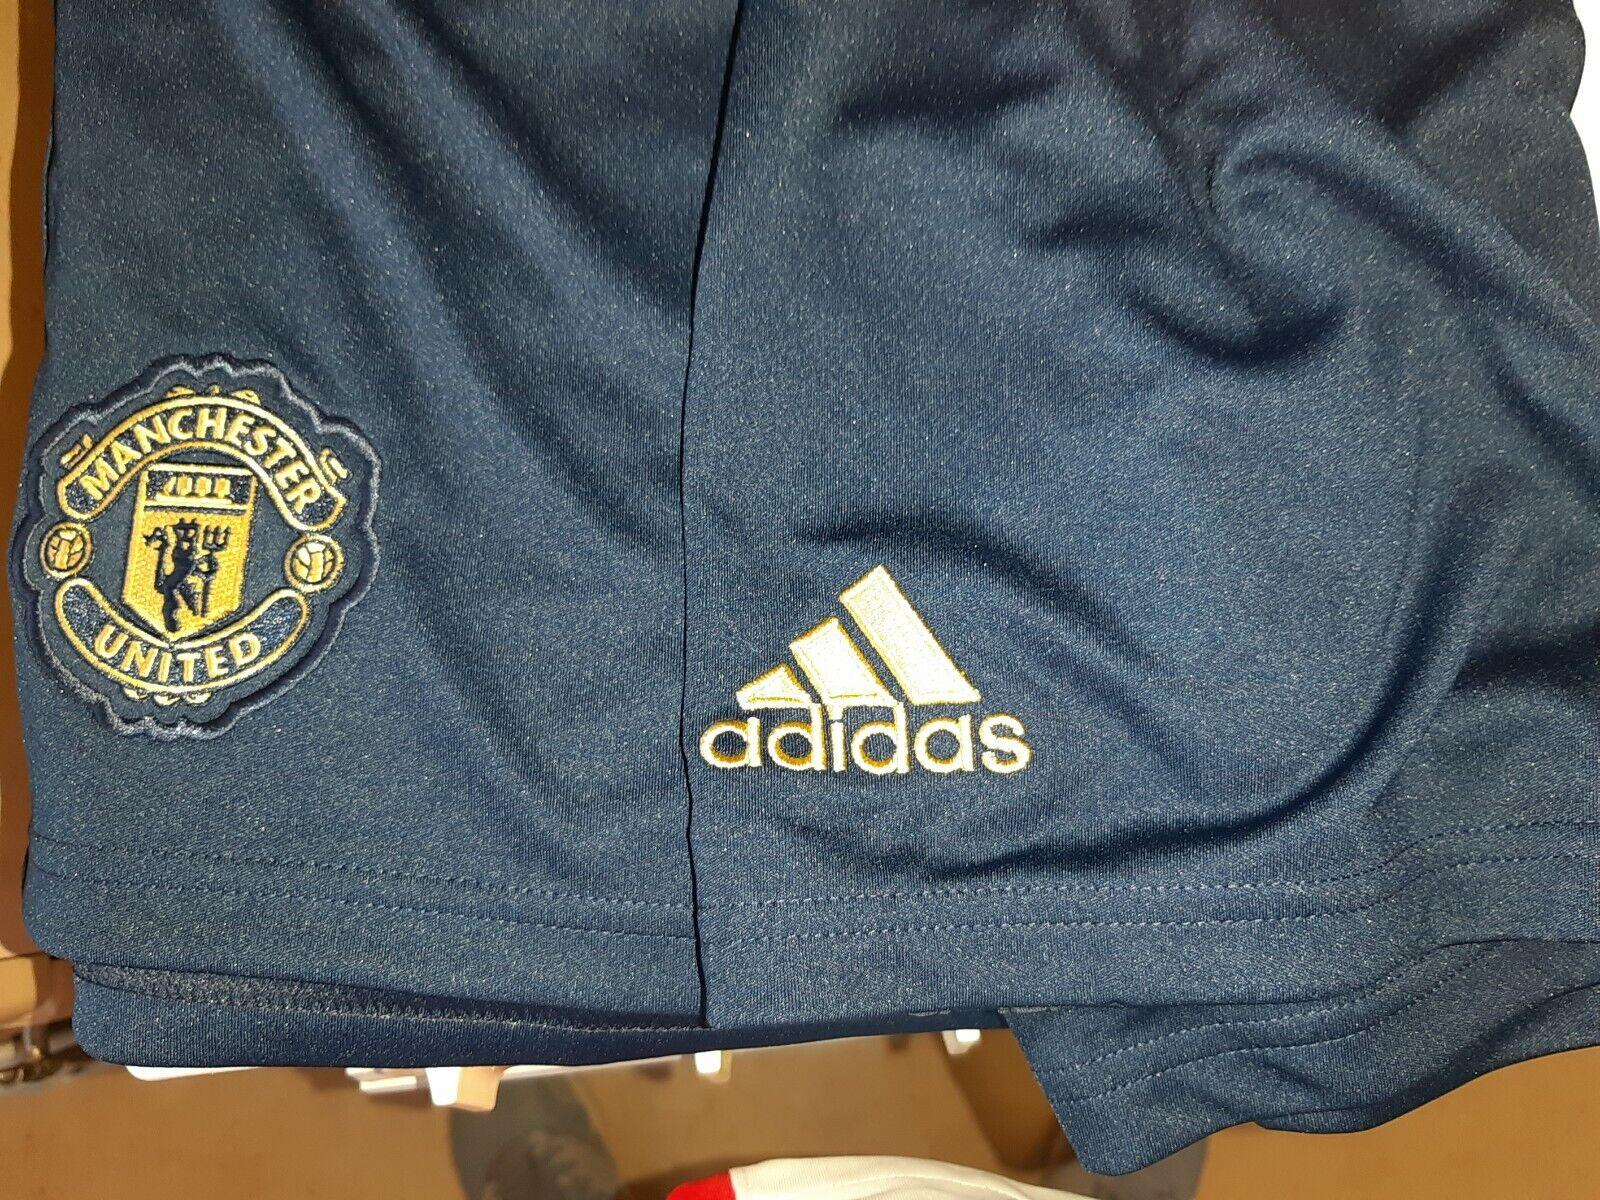 Men's -Adidas Manchester United FC 2018 19 third away Football Shorts Size XL